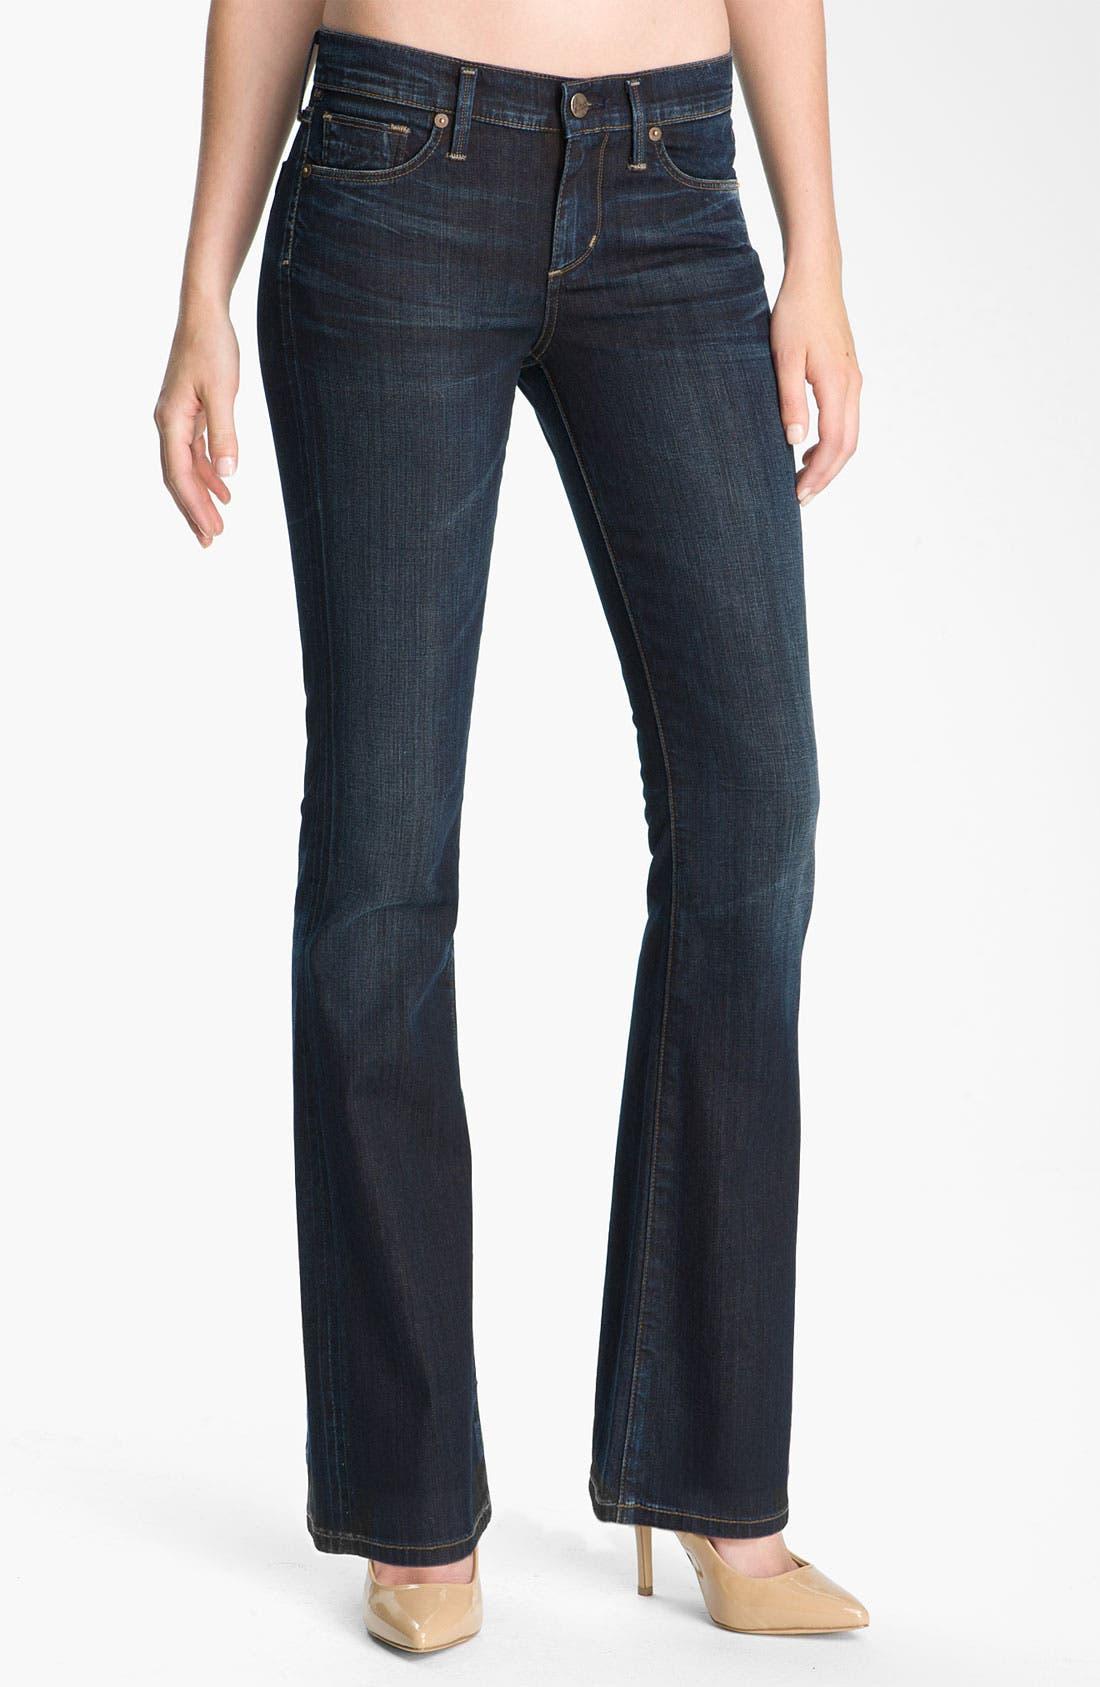 Alternate Image 1 Selected - Citizens of Humanity 'Dita' Bootcut Jeans (Felt Dark Blue) (Petite)